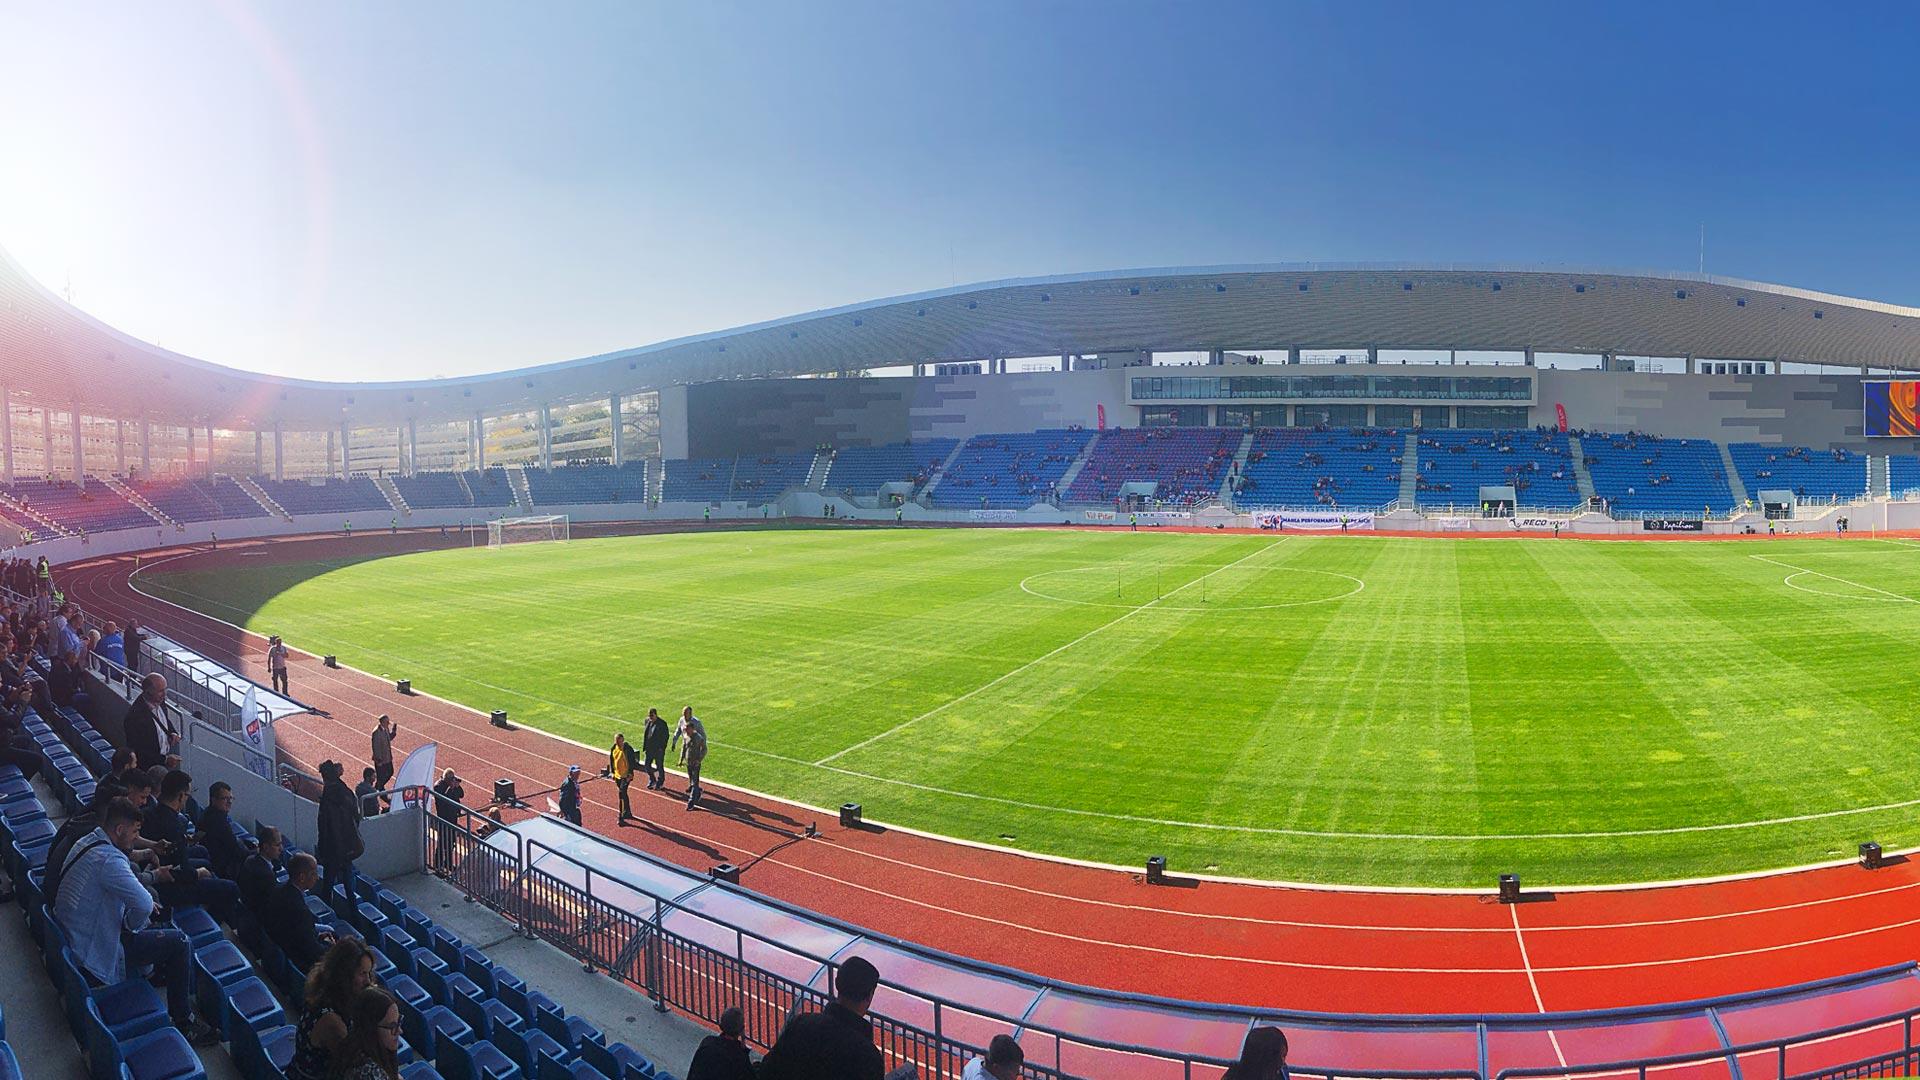 Târgu-Jiu Stadium, Opening, 2019